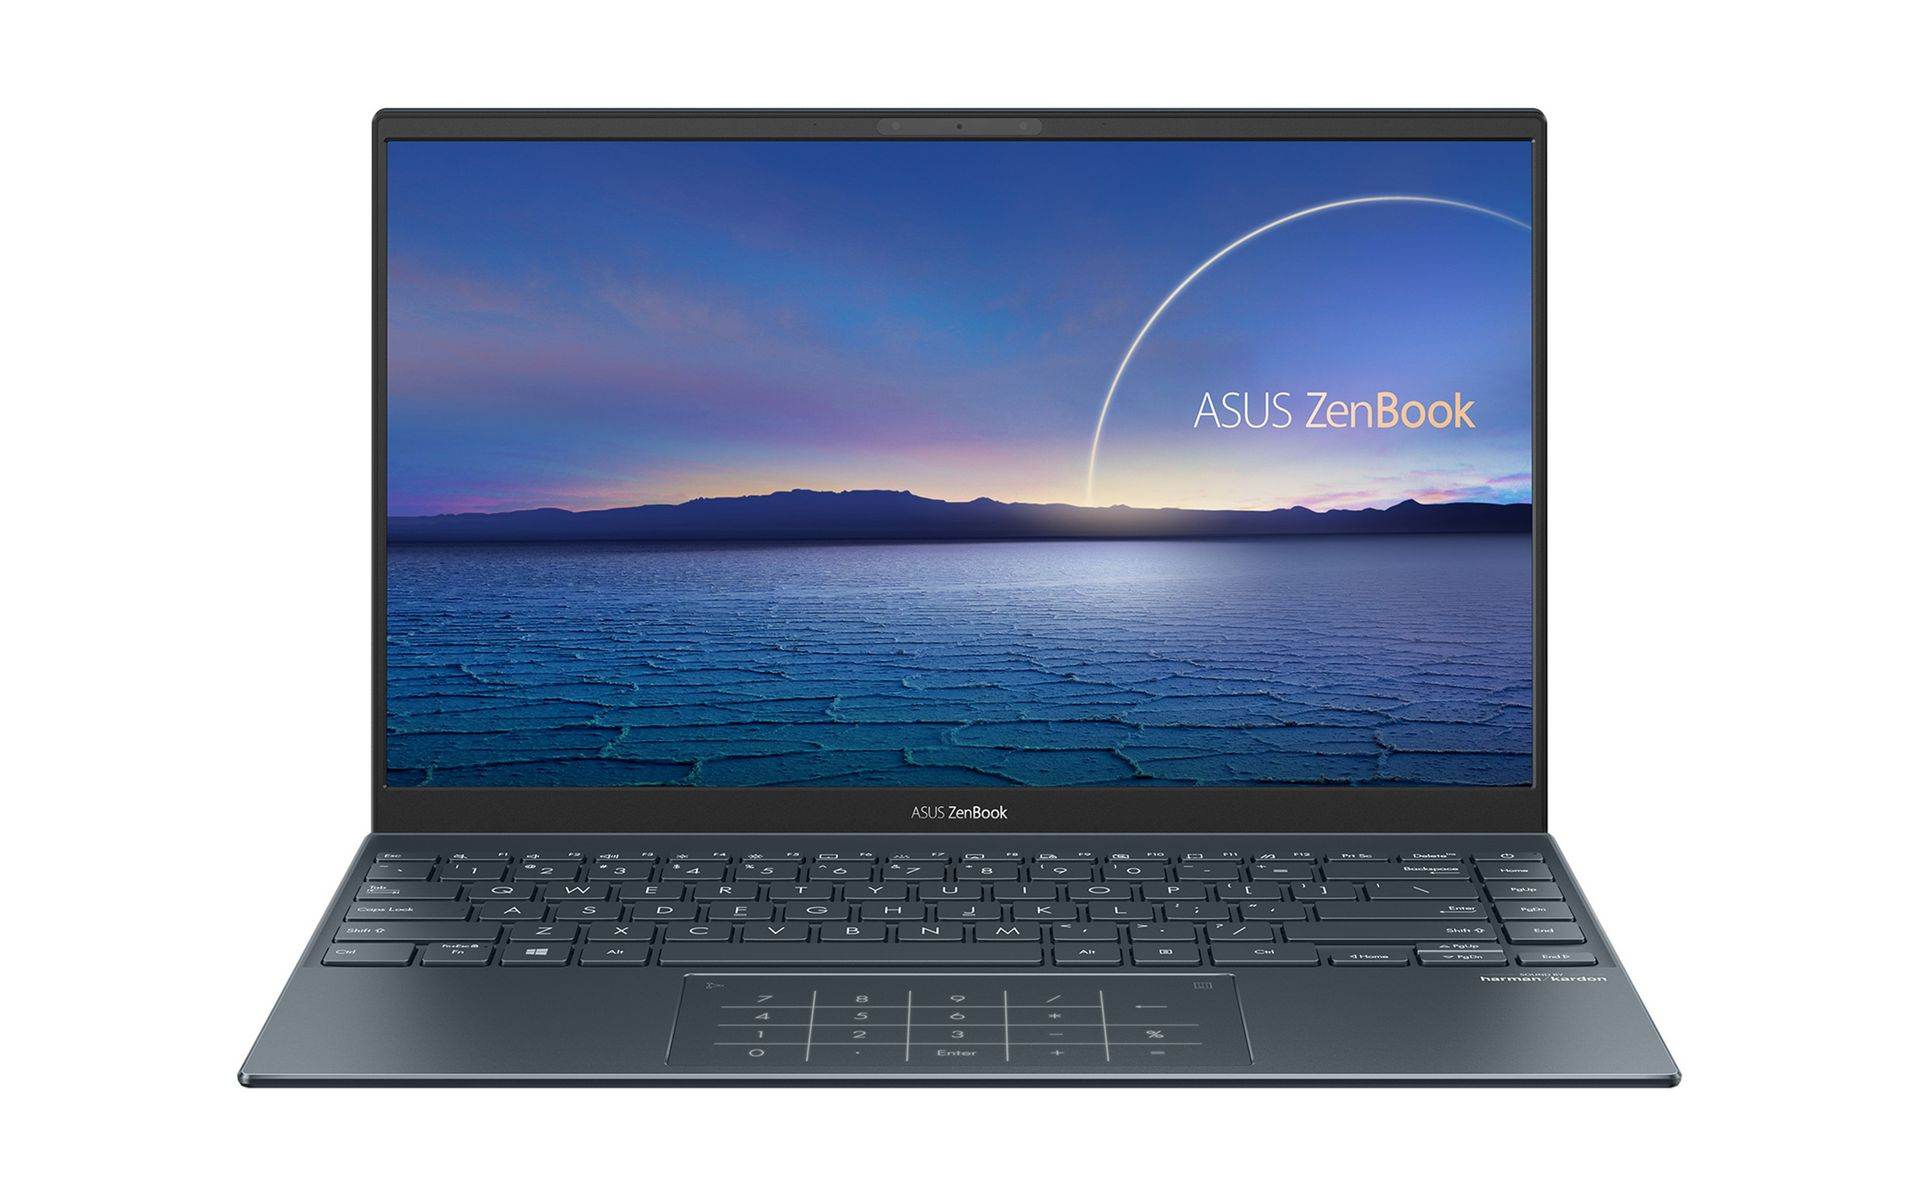 Laptop Asus ZenBook 14 UX425EA-BM069T có màn hình NanoEdge